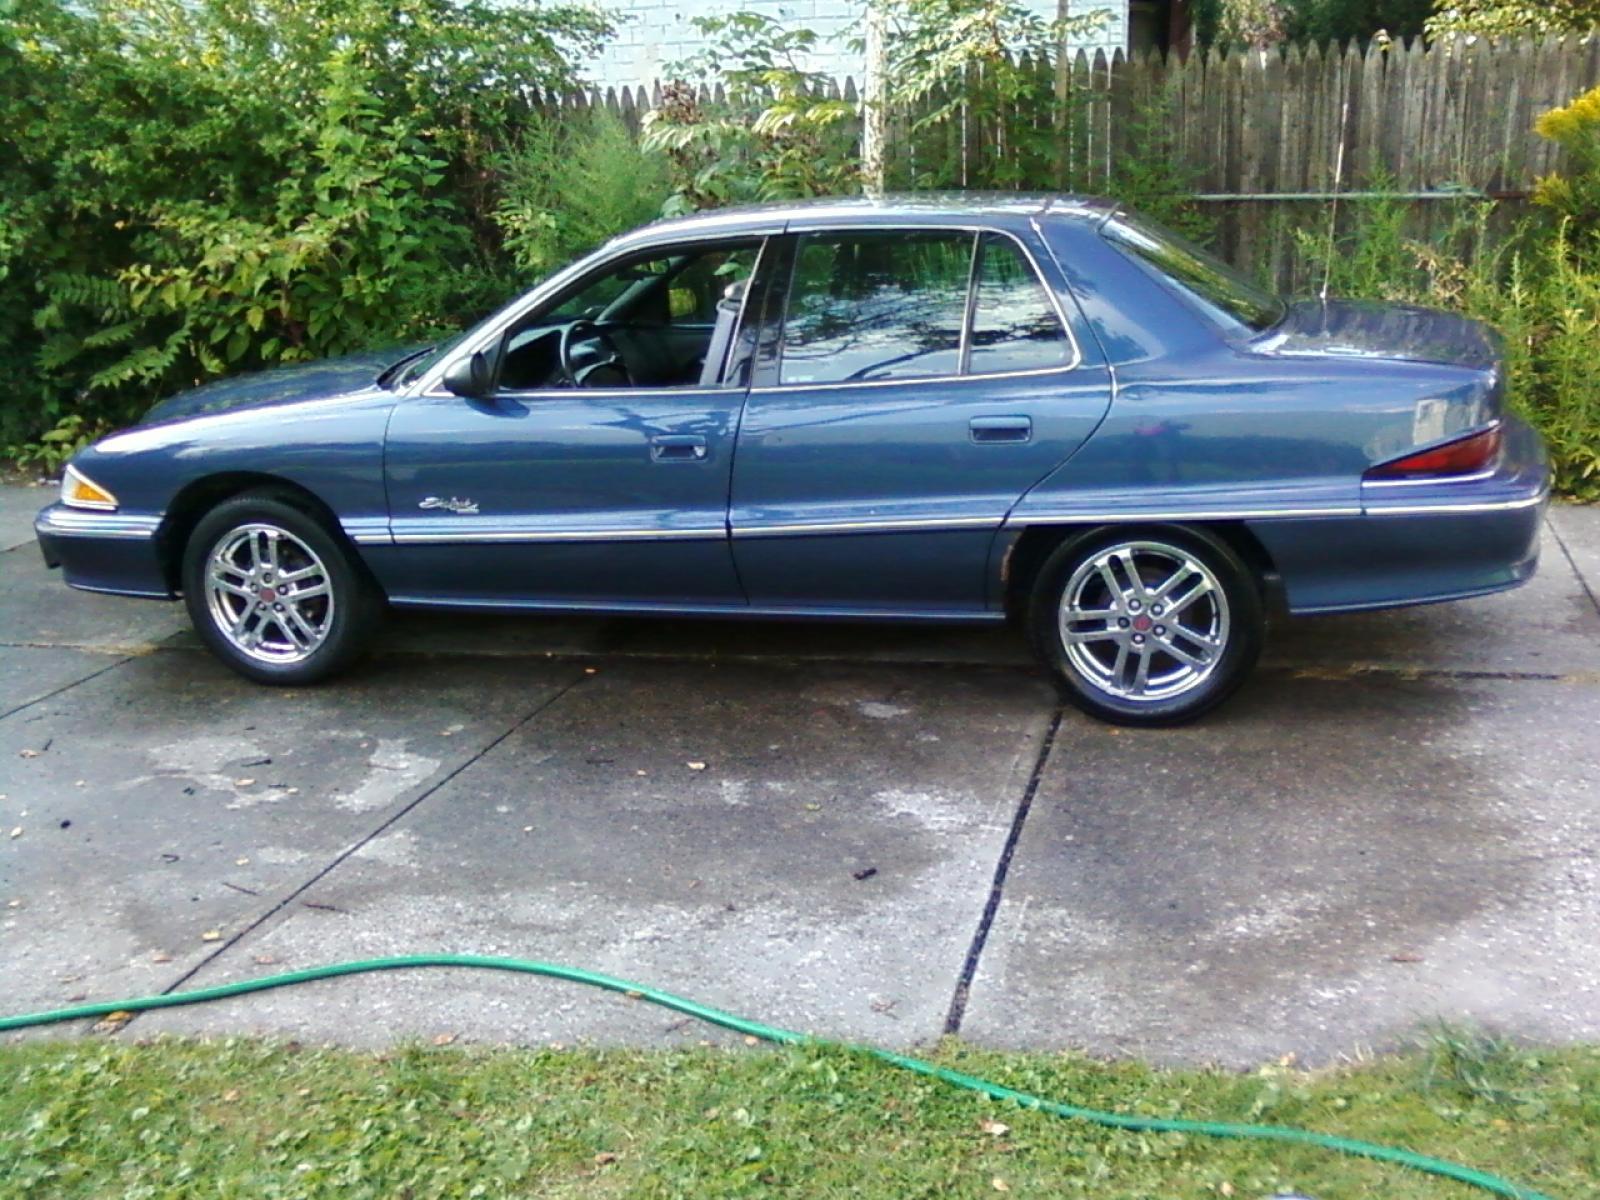 1993 Mercury Topaz Fuse Box Diagram Cougar 1972 Buick Riviera Wiring 1971 U2022 1992 Sable Panel For